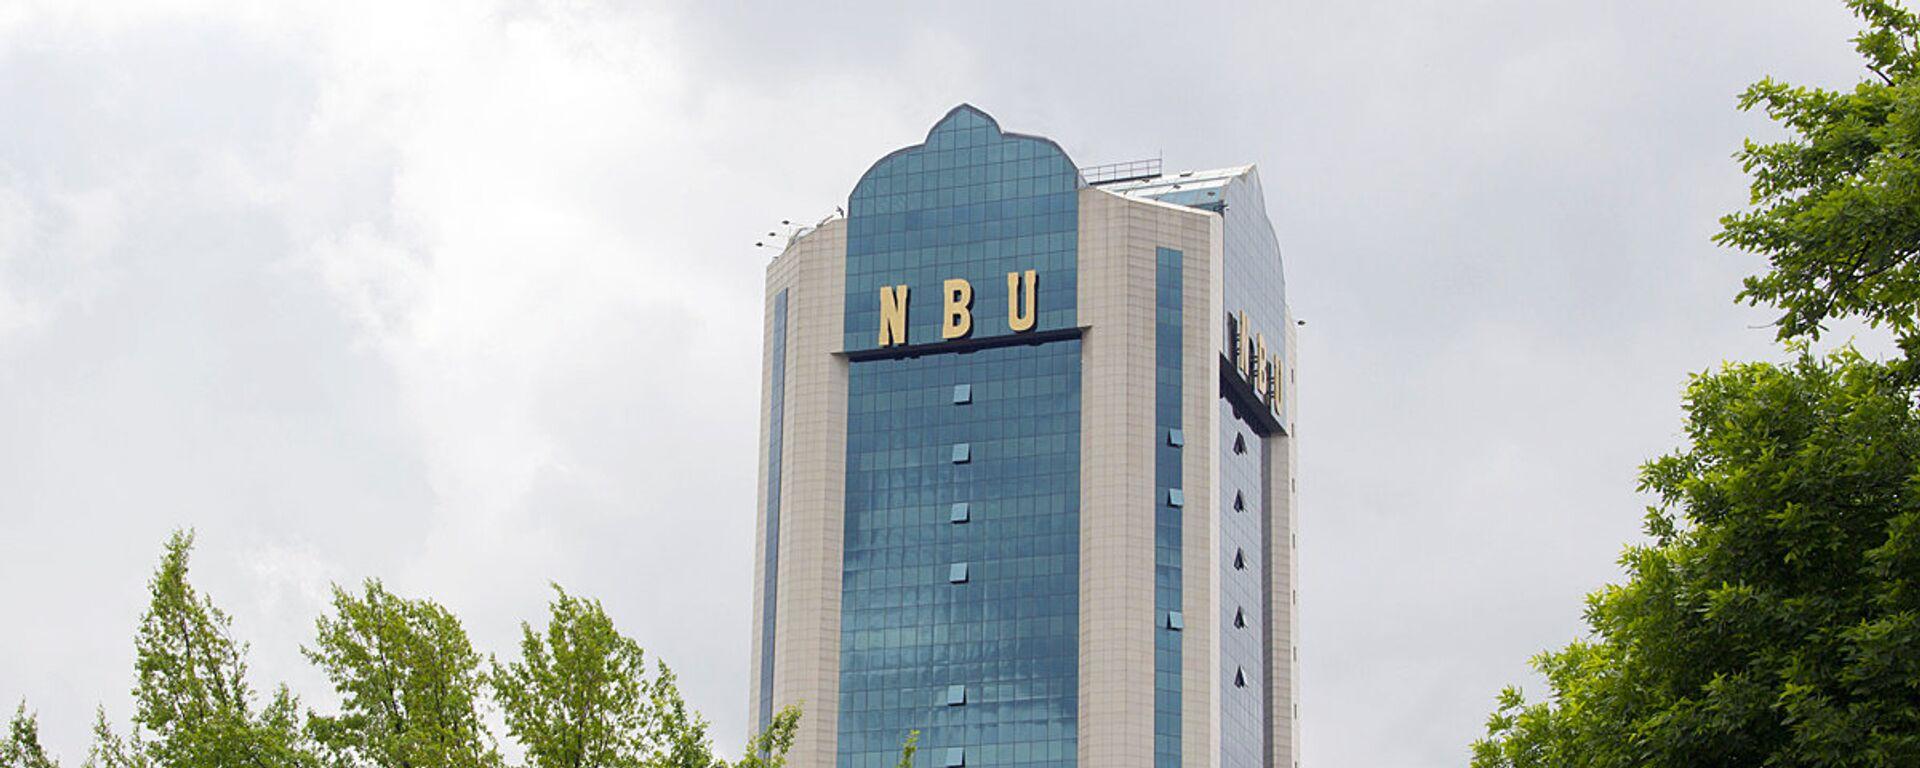 Здание Национального Банка Узбекистана - Sputnik Узбекистан, 1920, 27.05.2021